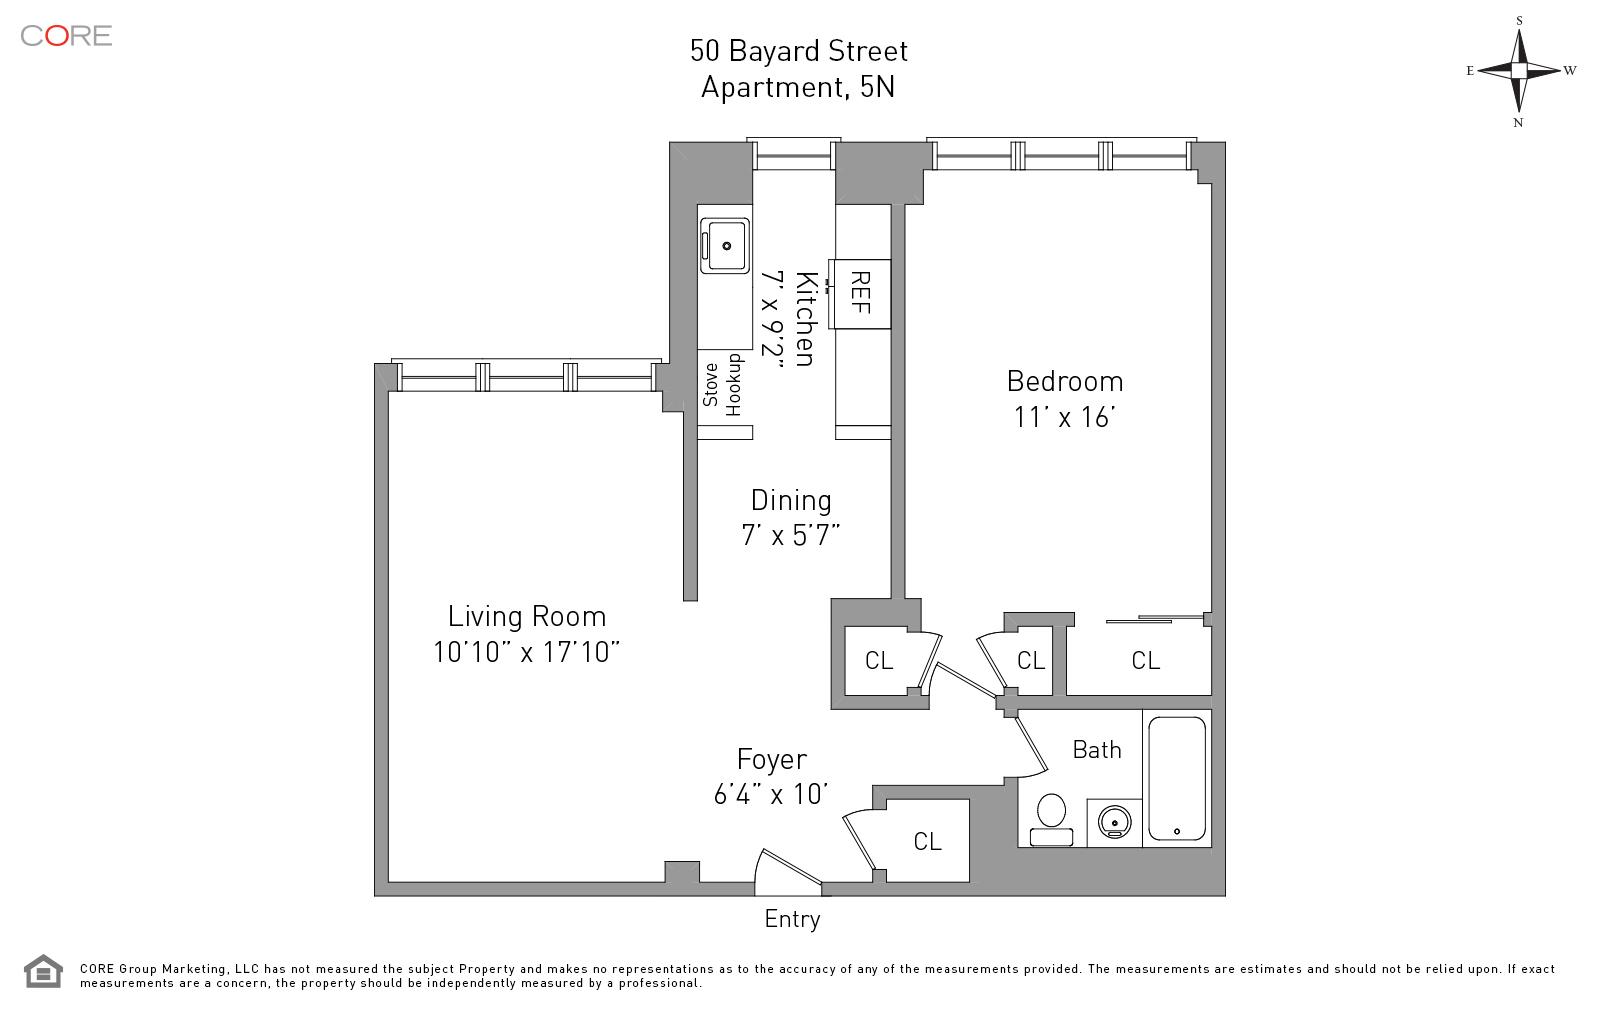 50 Bayard St. 5N, New York, NY 10013